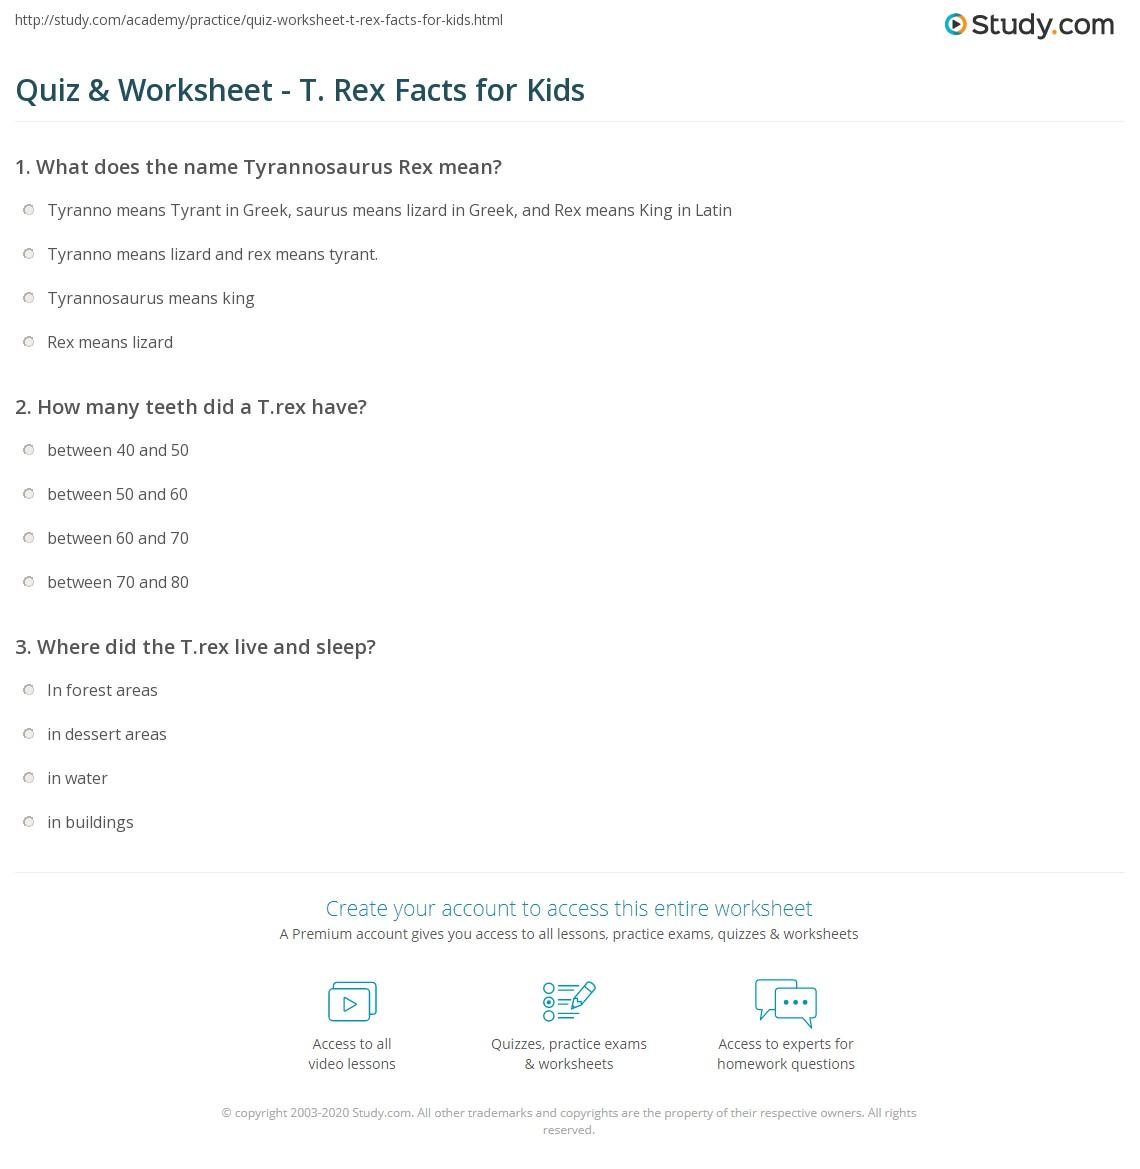 quiz-worksheet-t-rex-facts-for-kids